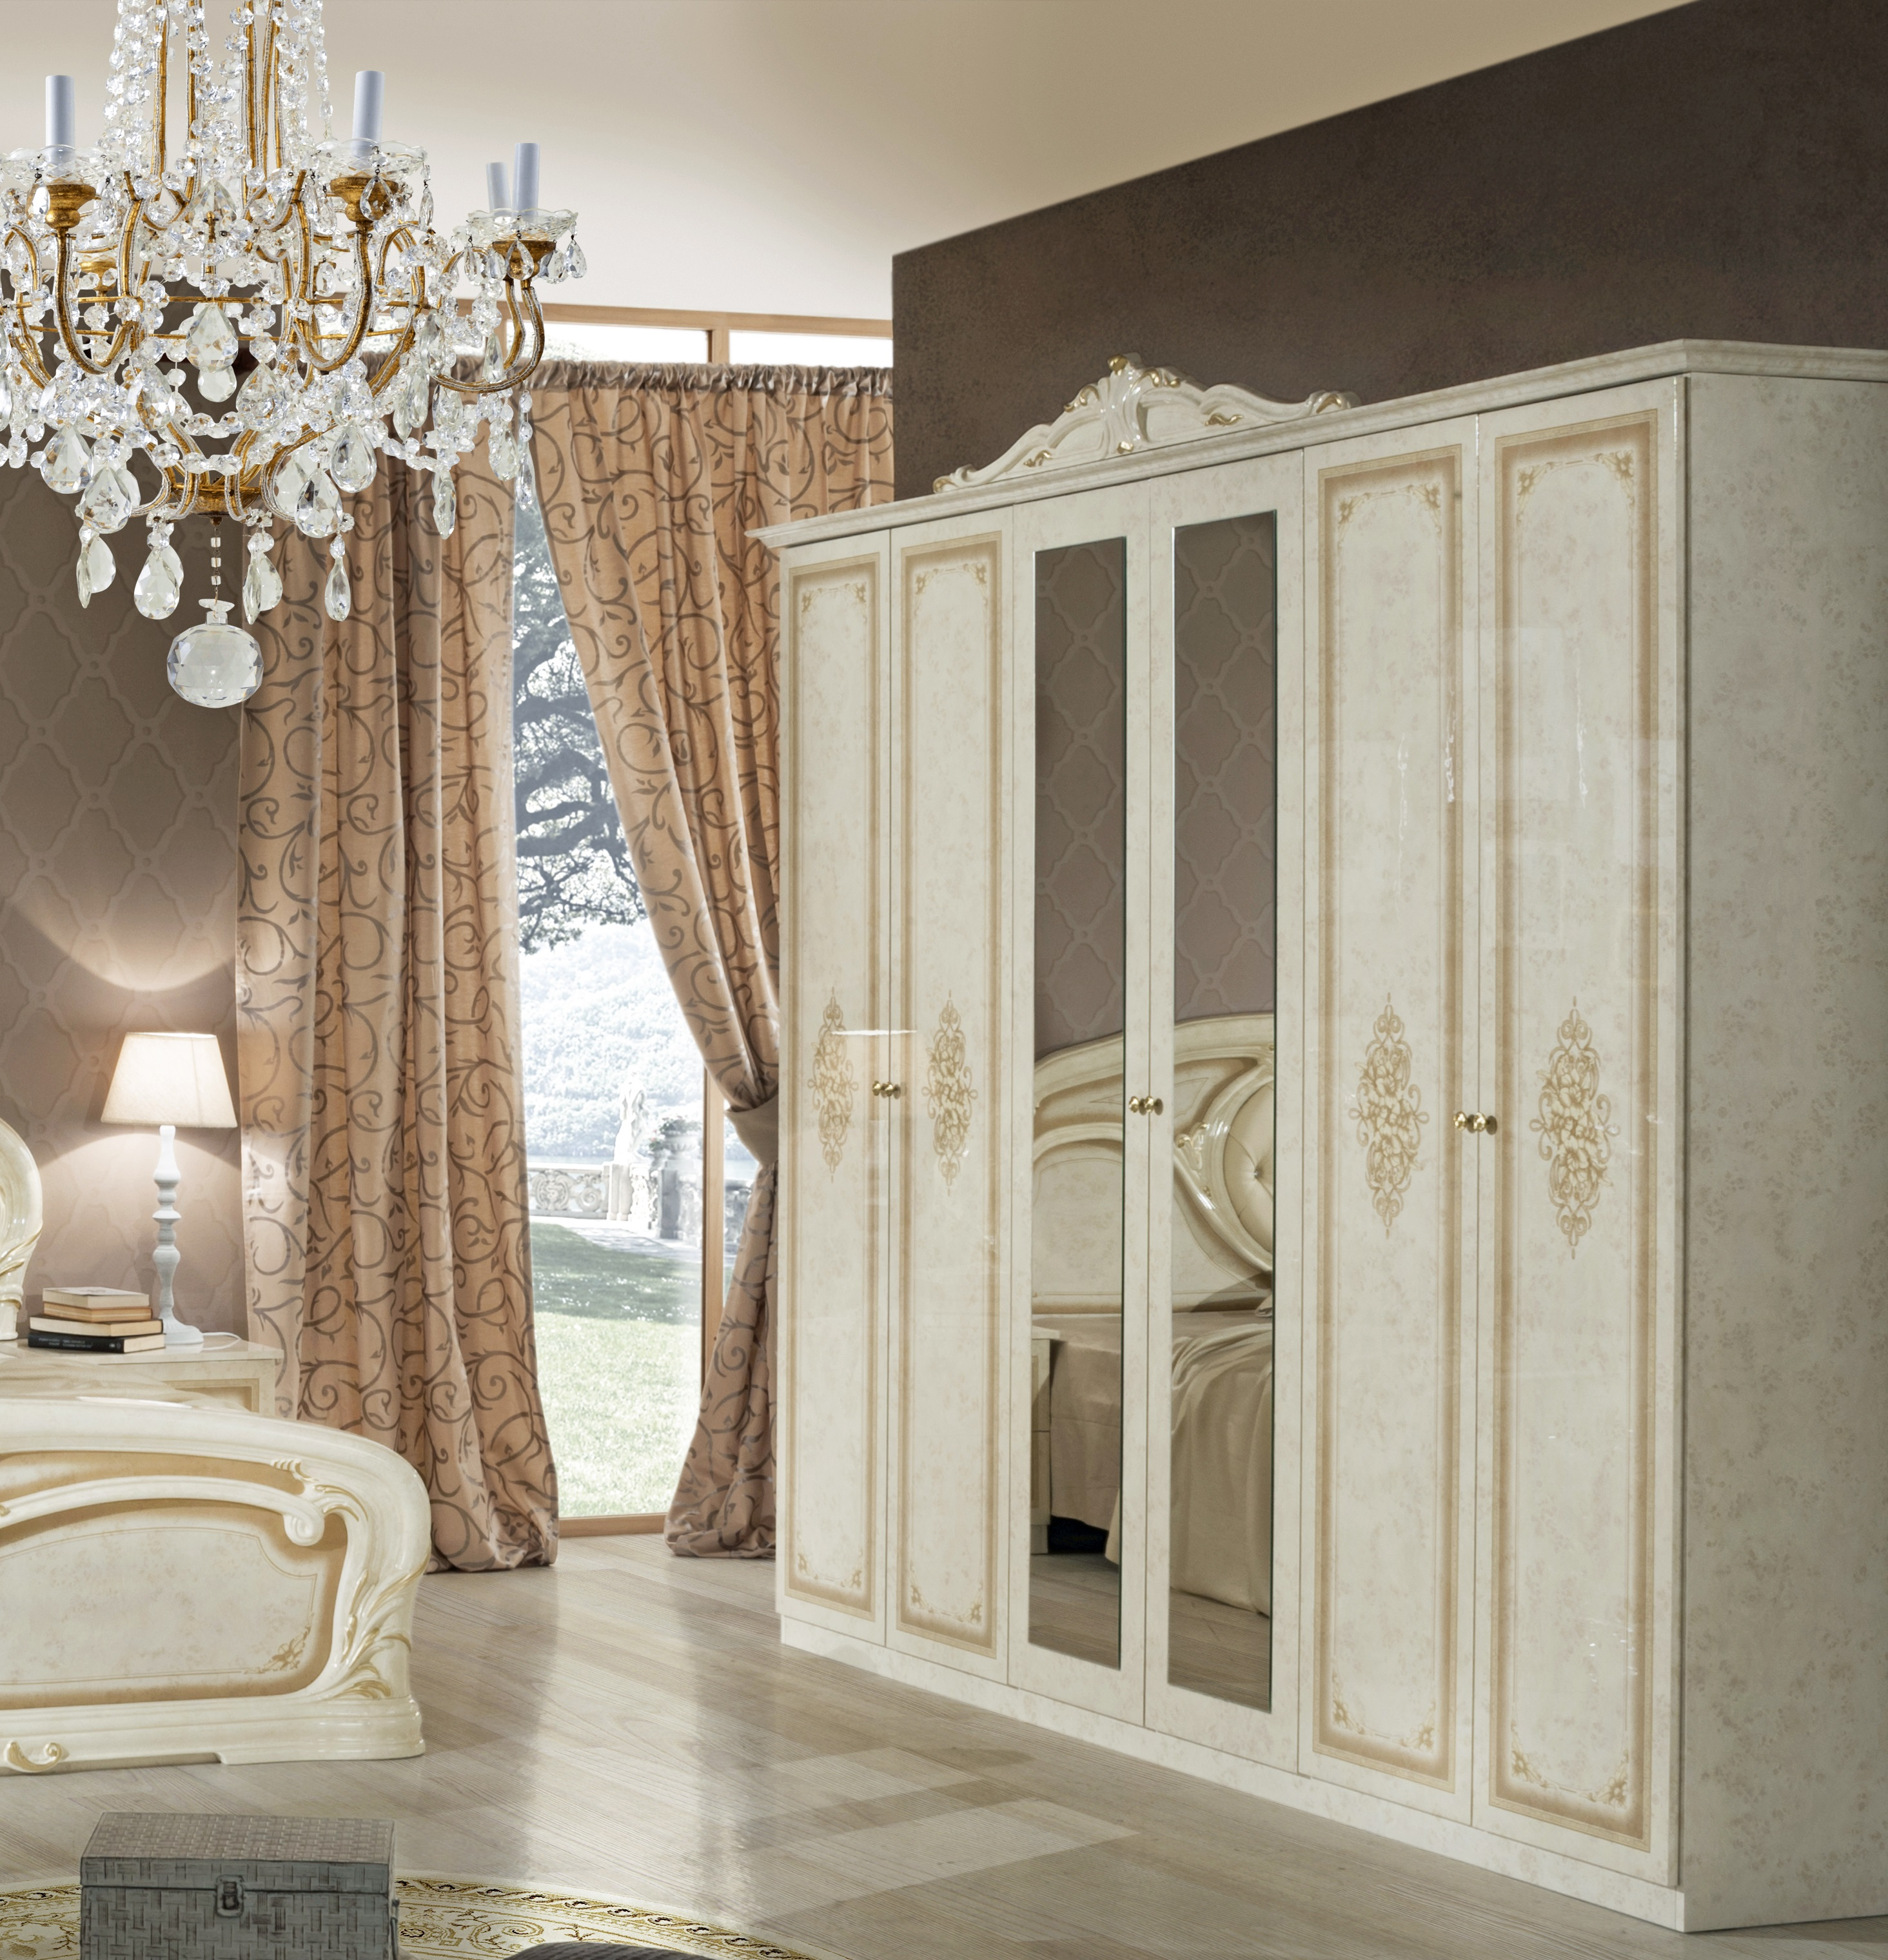 barock schlafzimmer klassisches schlafzimmer. Black Bedroom Furniture Sets. Home Design Ideas